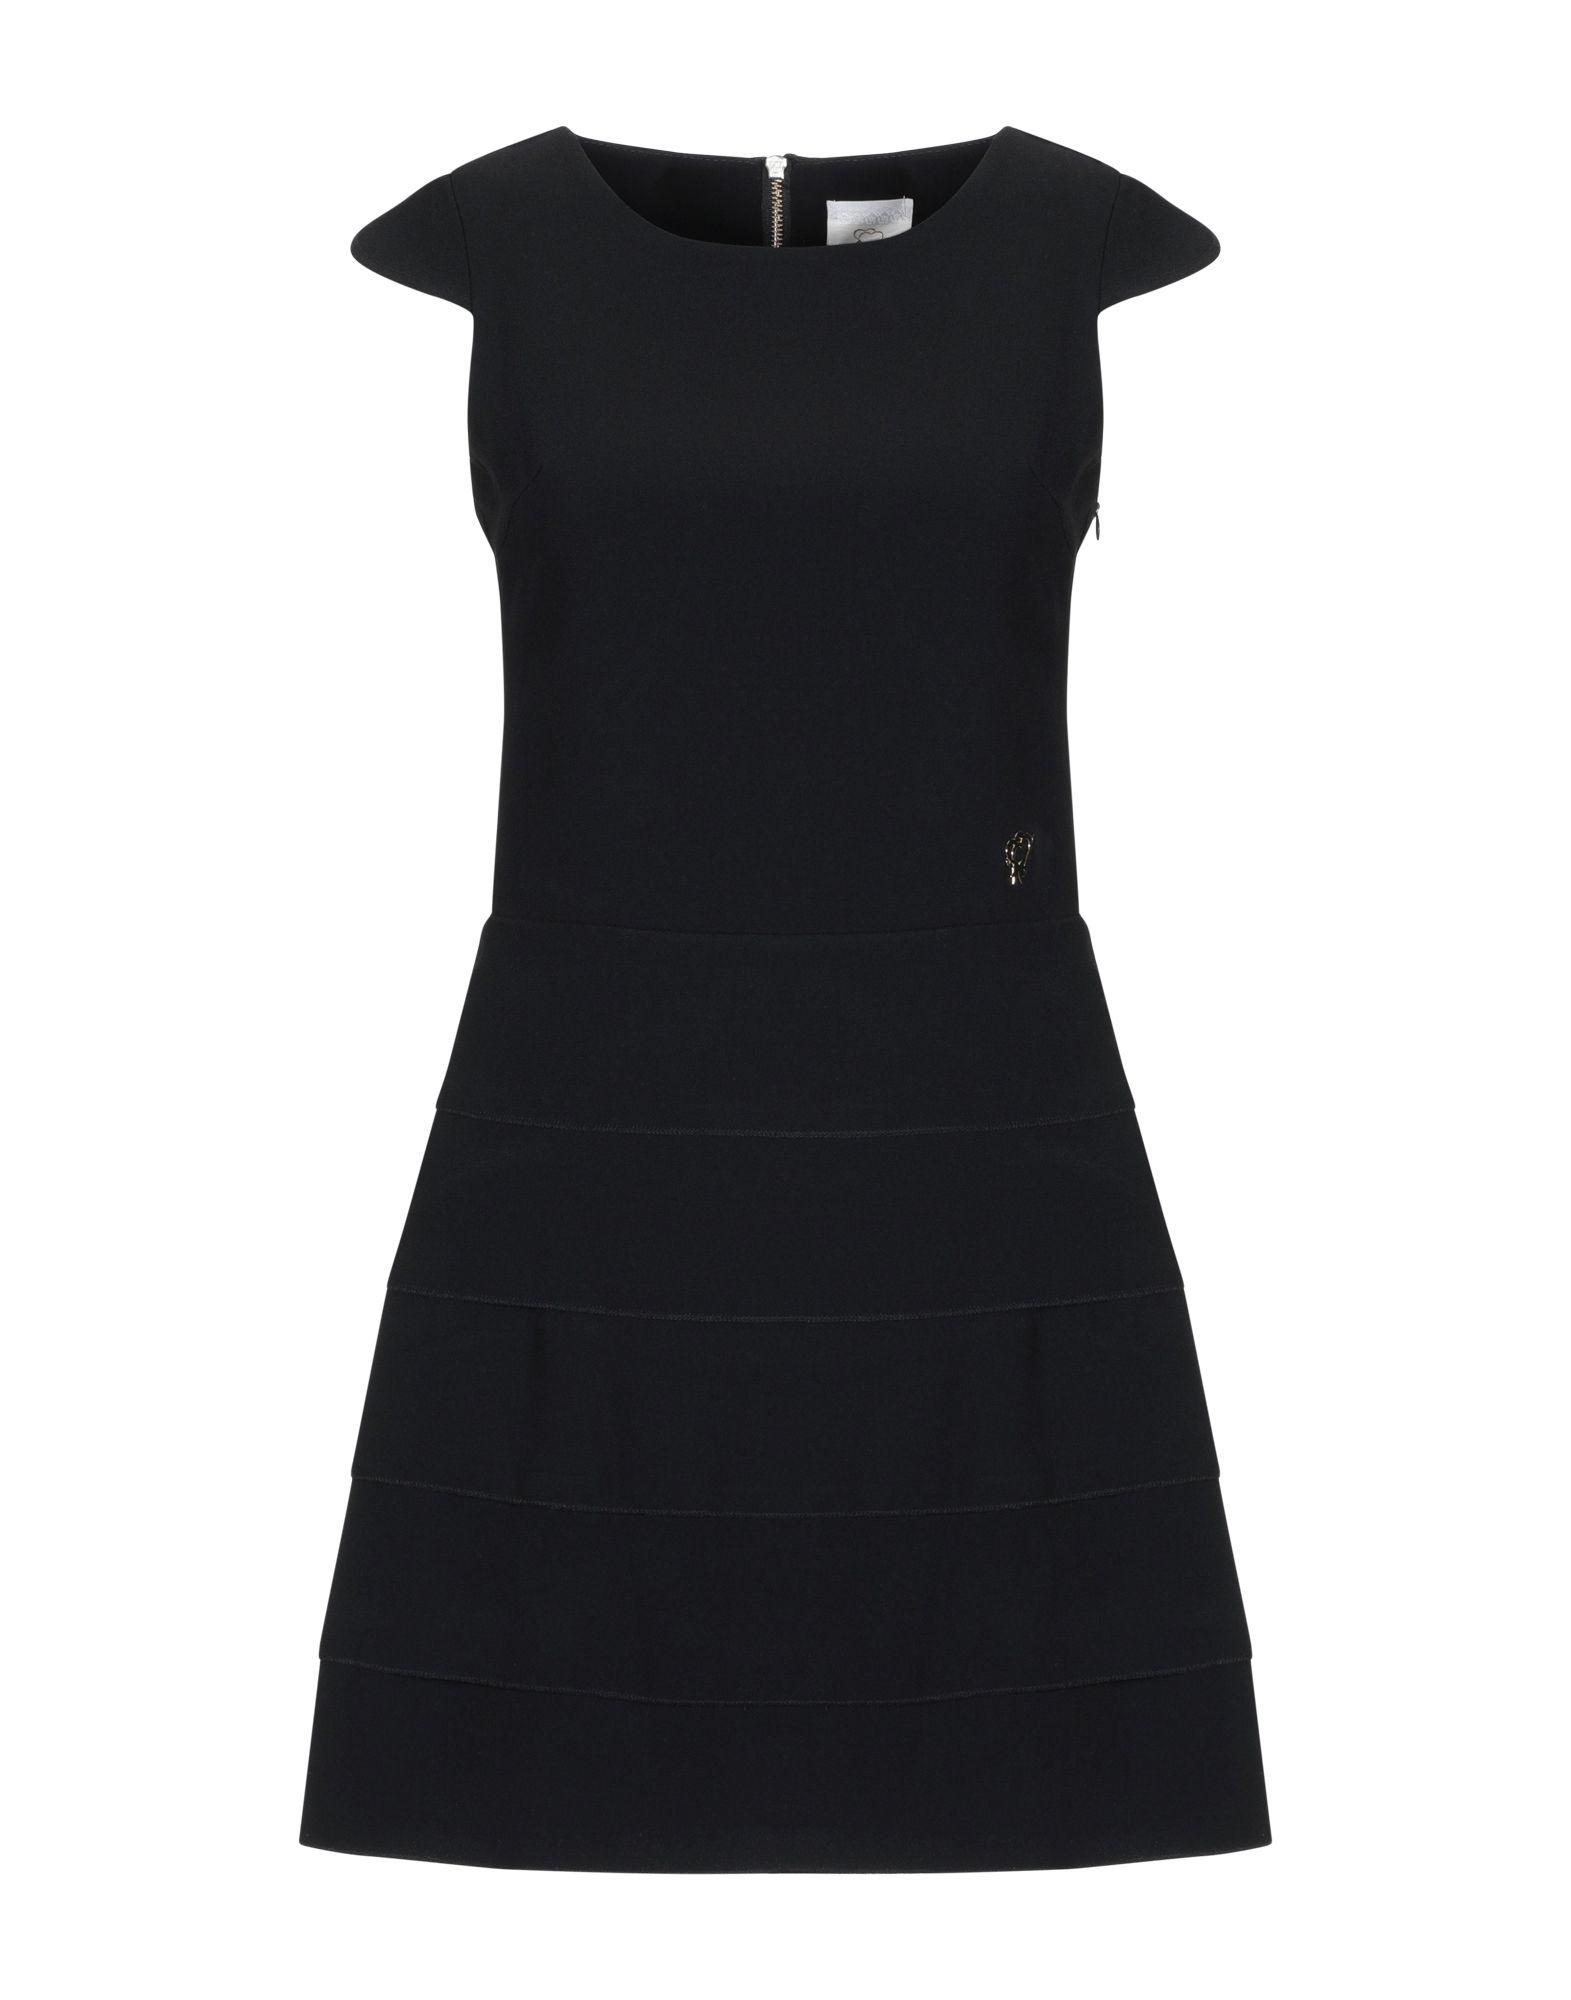 MAISON ESPIN Короткое платье maison espin юбка до колена